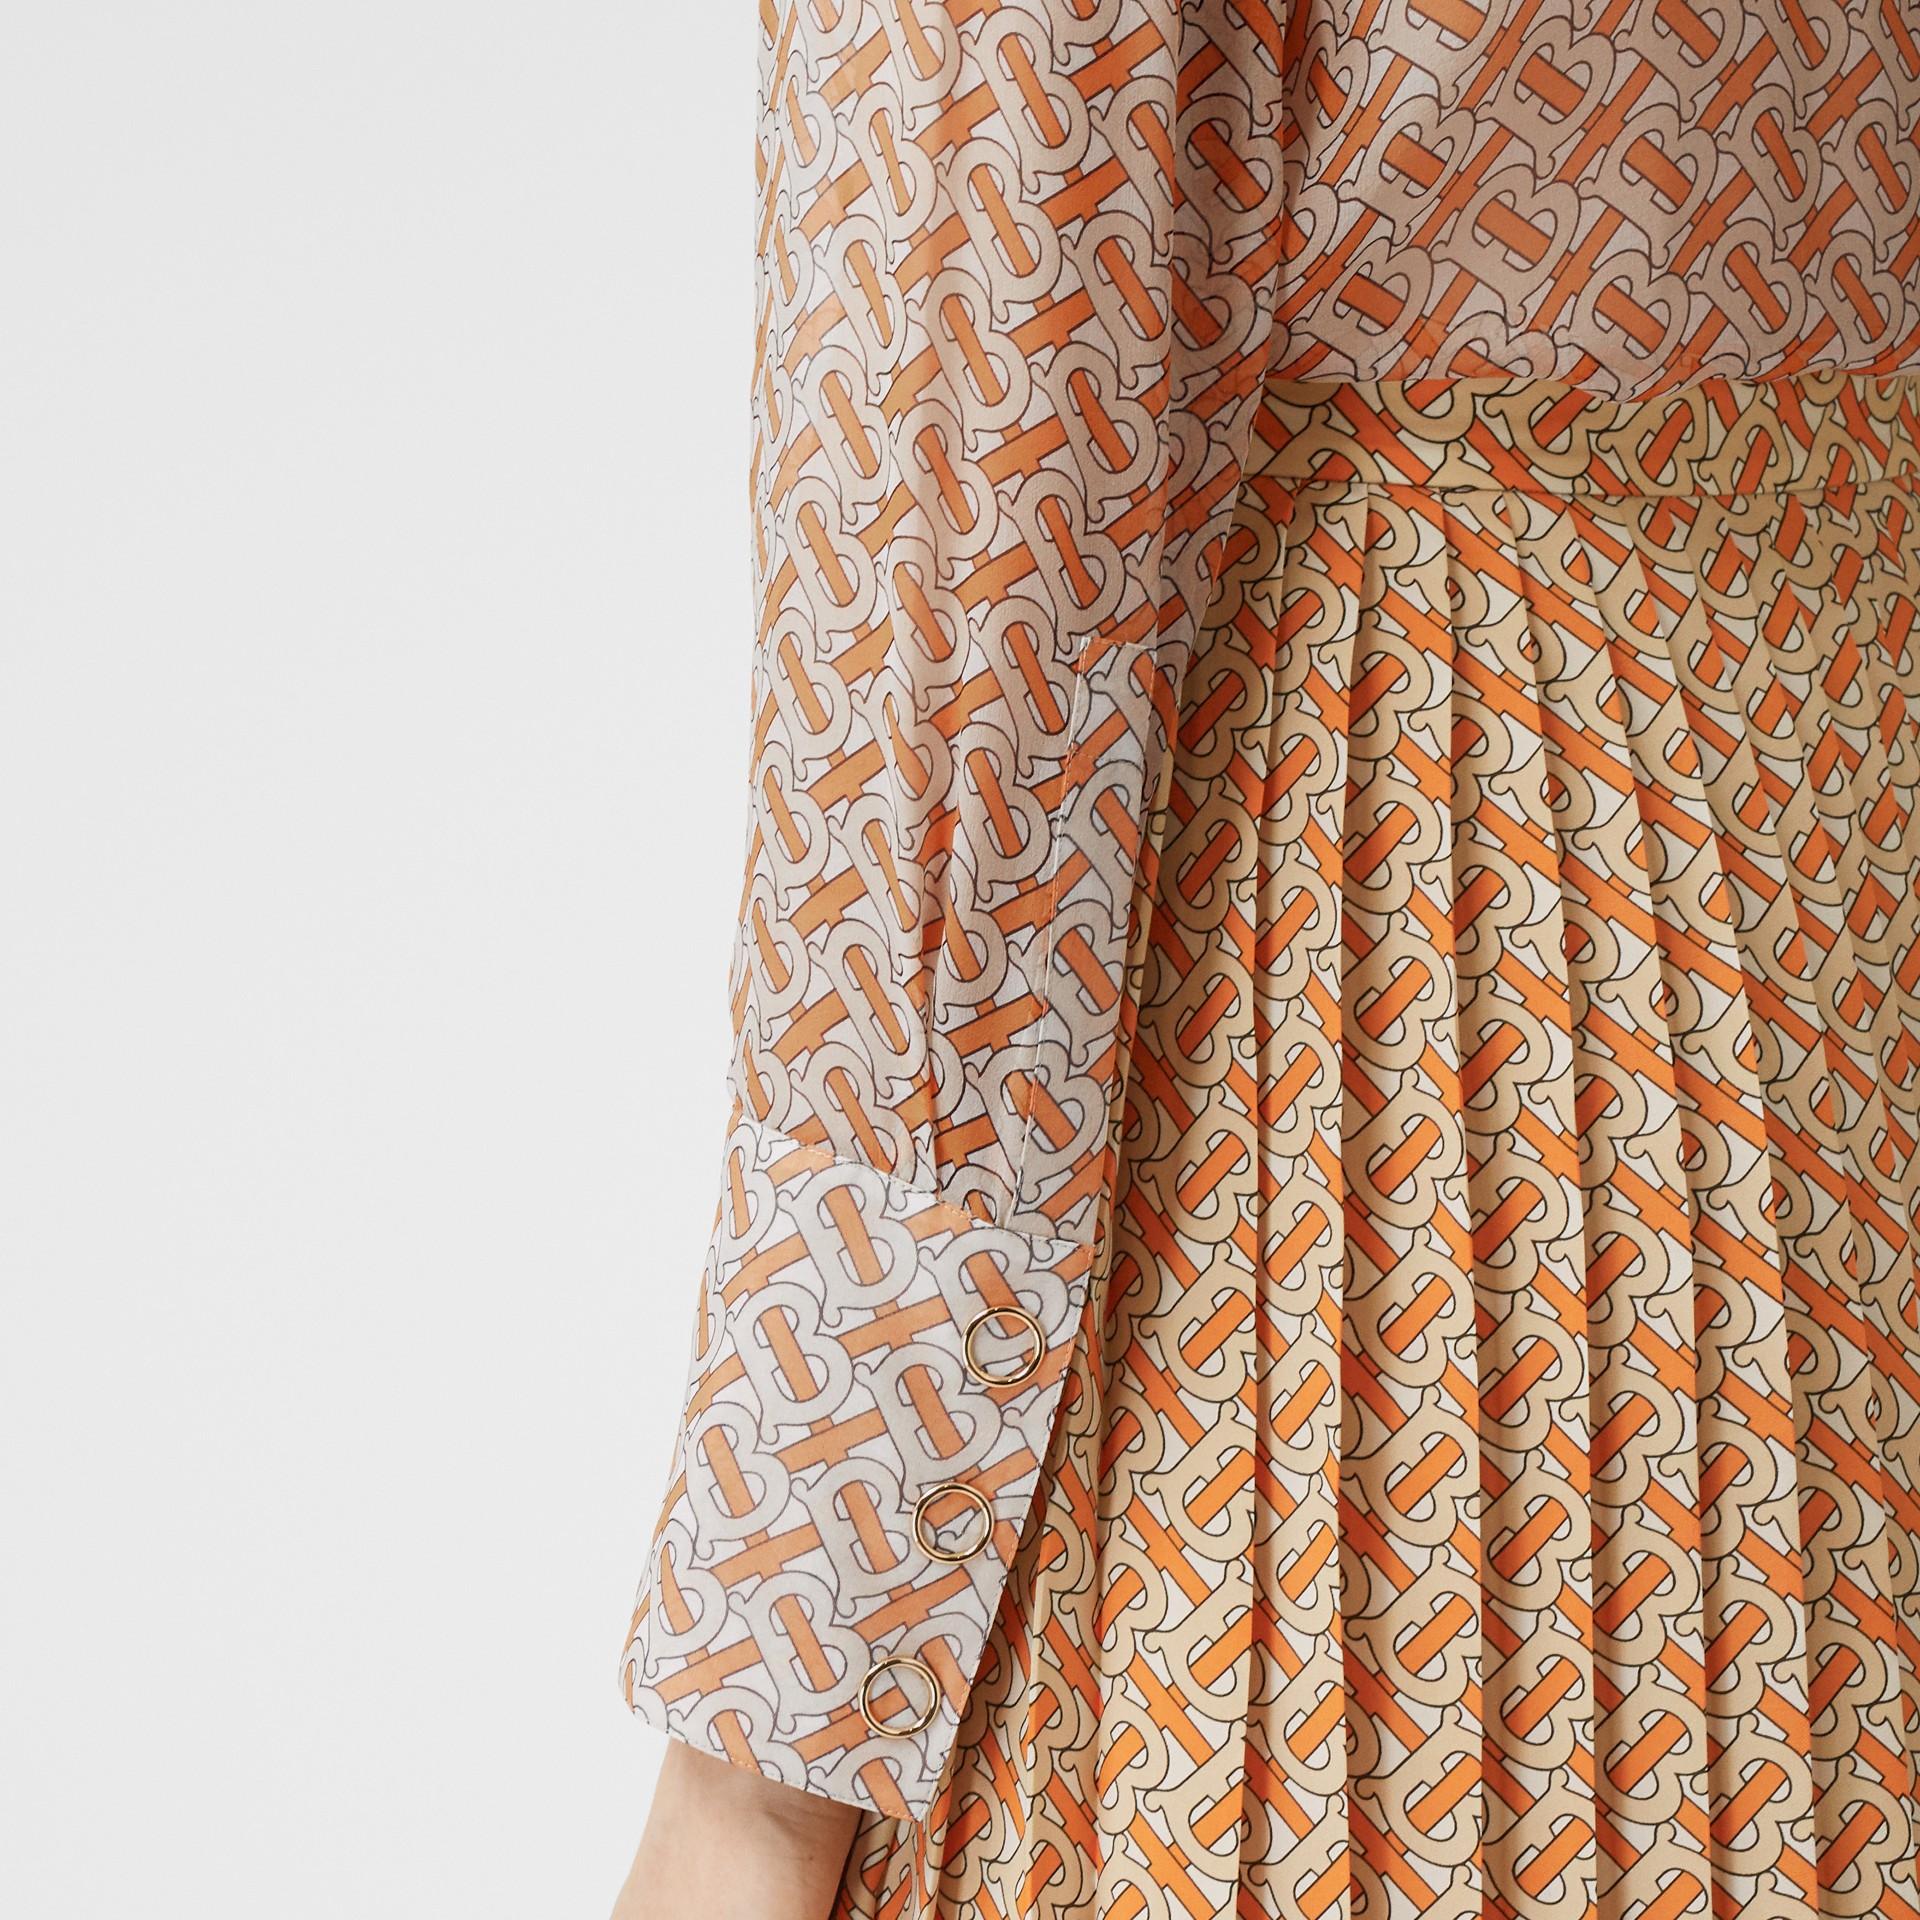 Monogram Print Silk Chiffon Pussy-bow Blouse in Bright Orange - Women | Burberry - gallery image 4